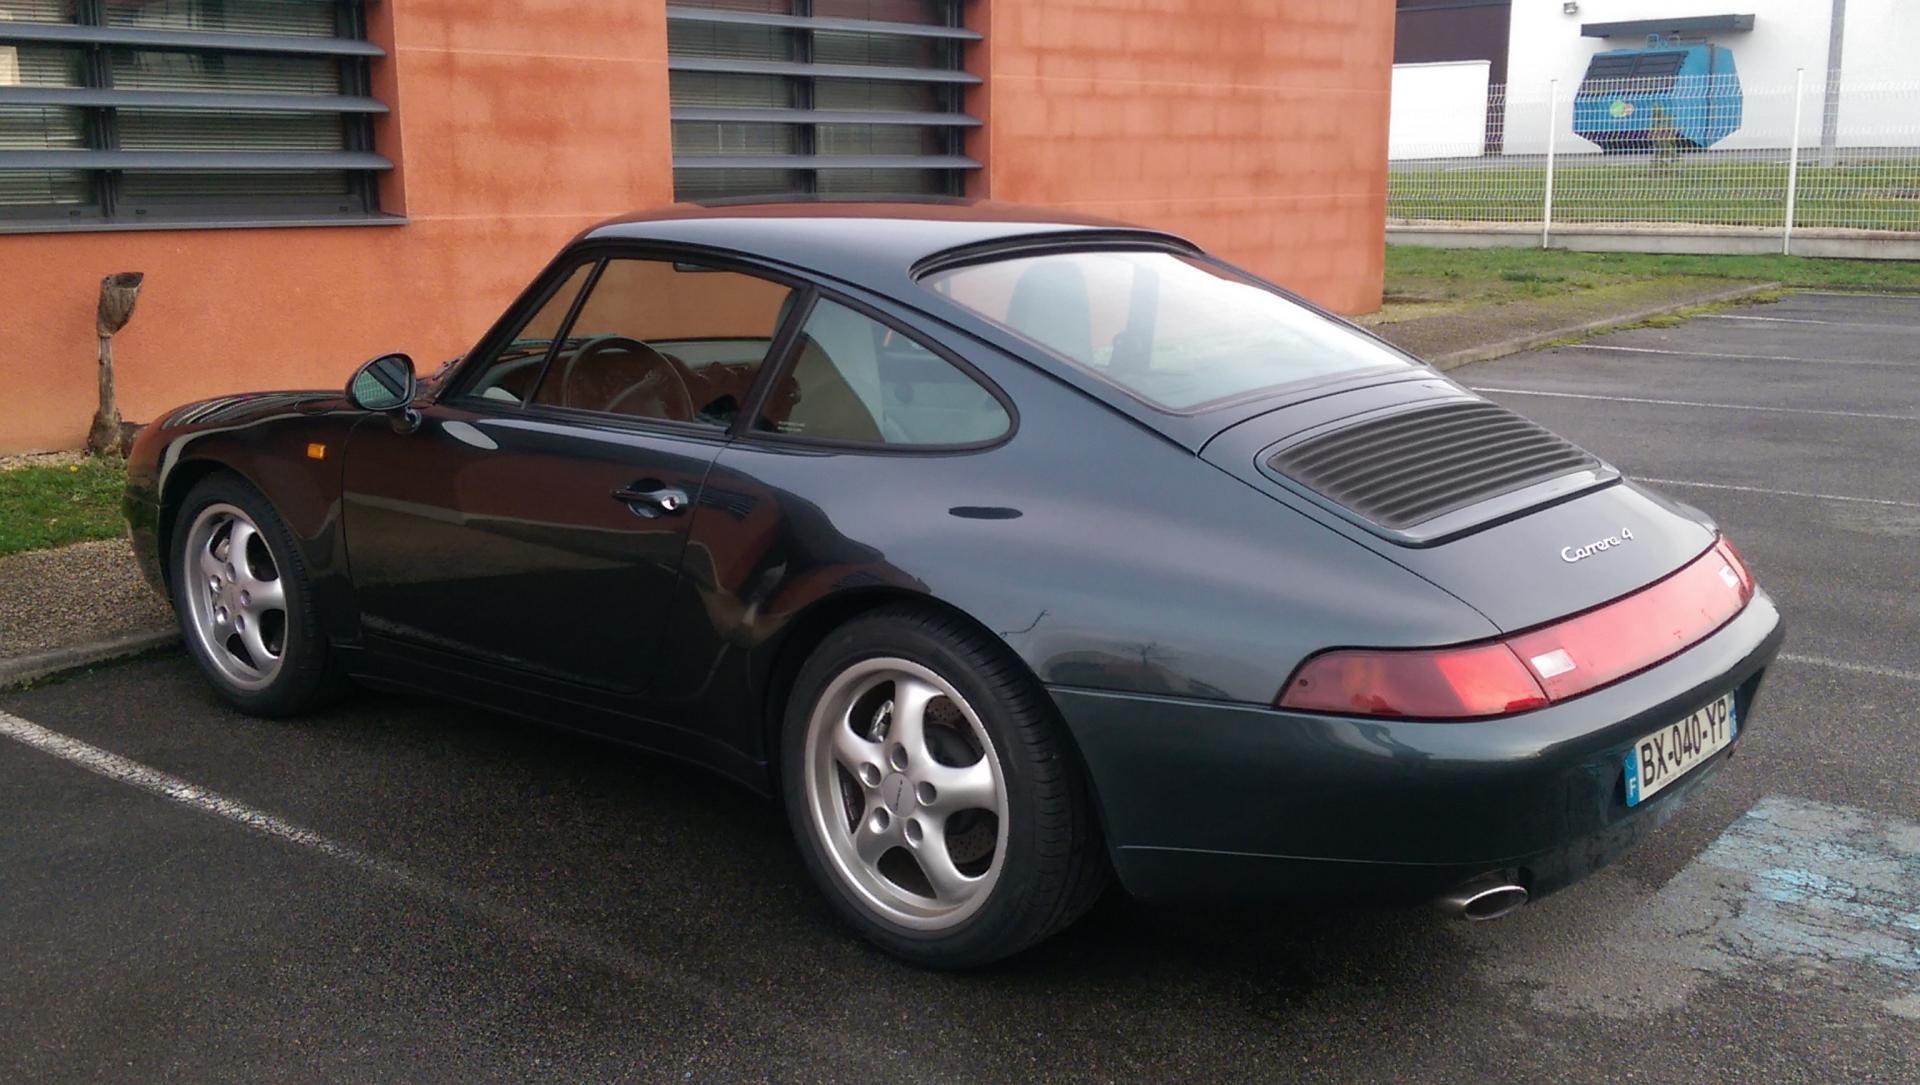 Porsche 993 272 ch Carrera 4 (Porsche 993)